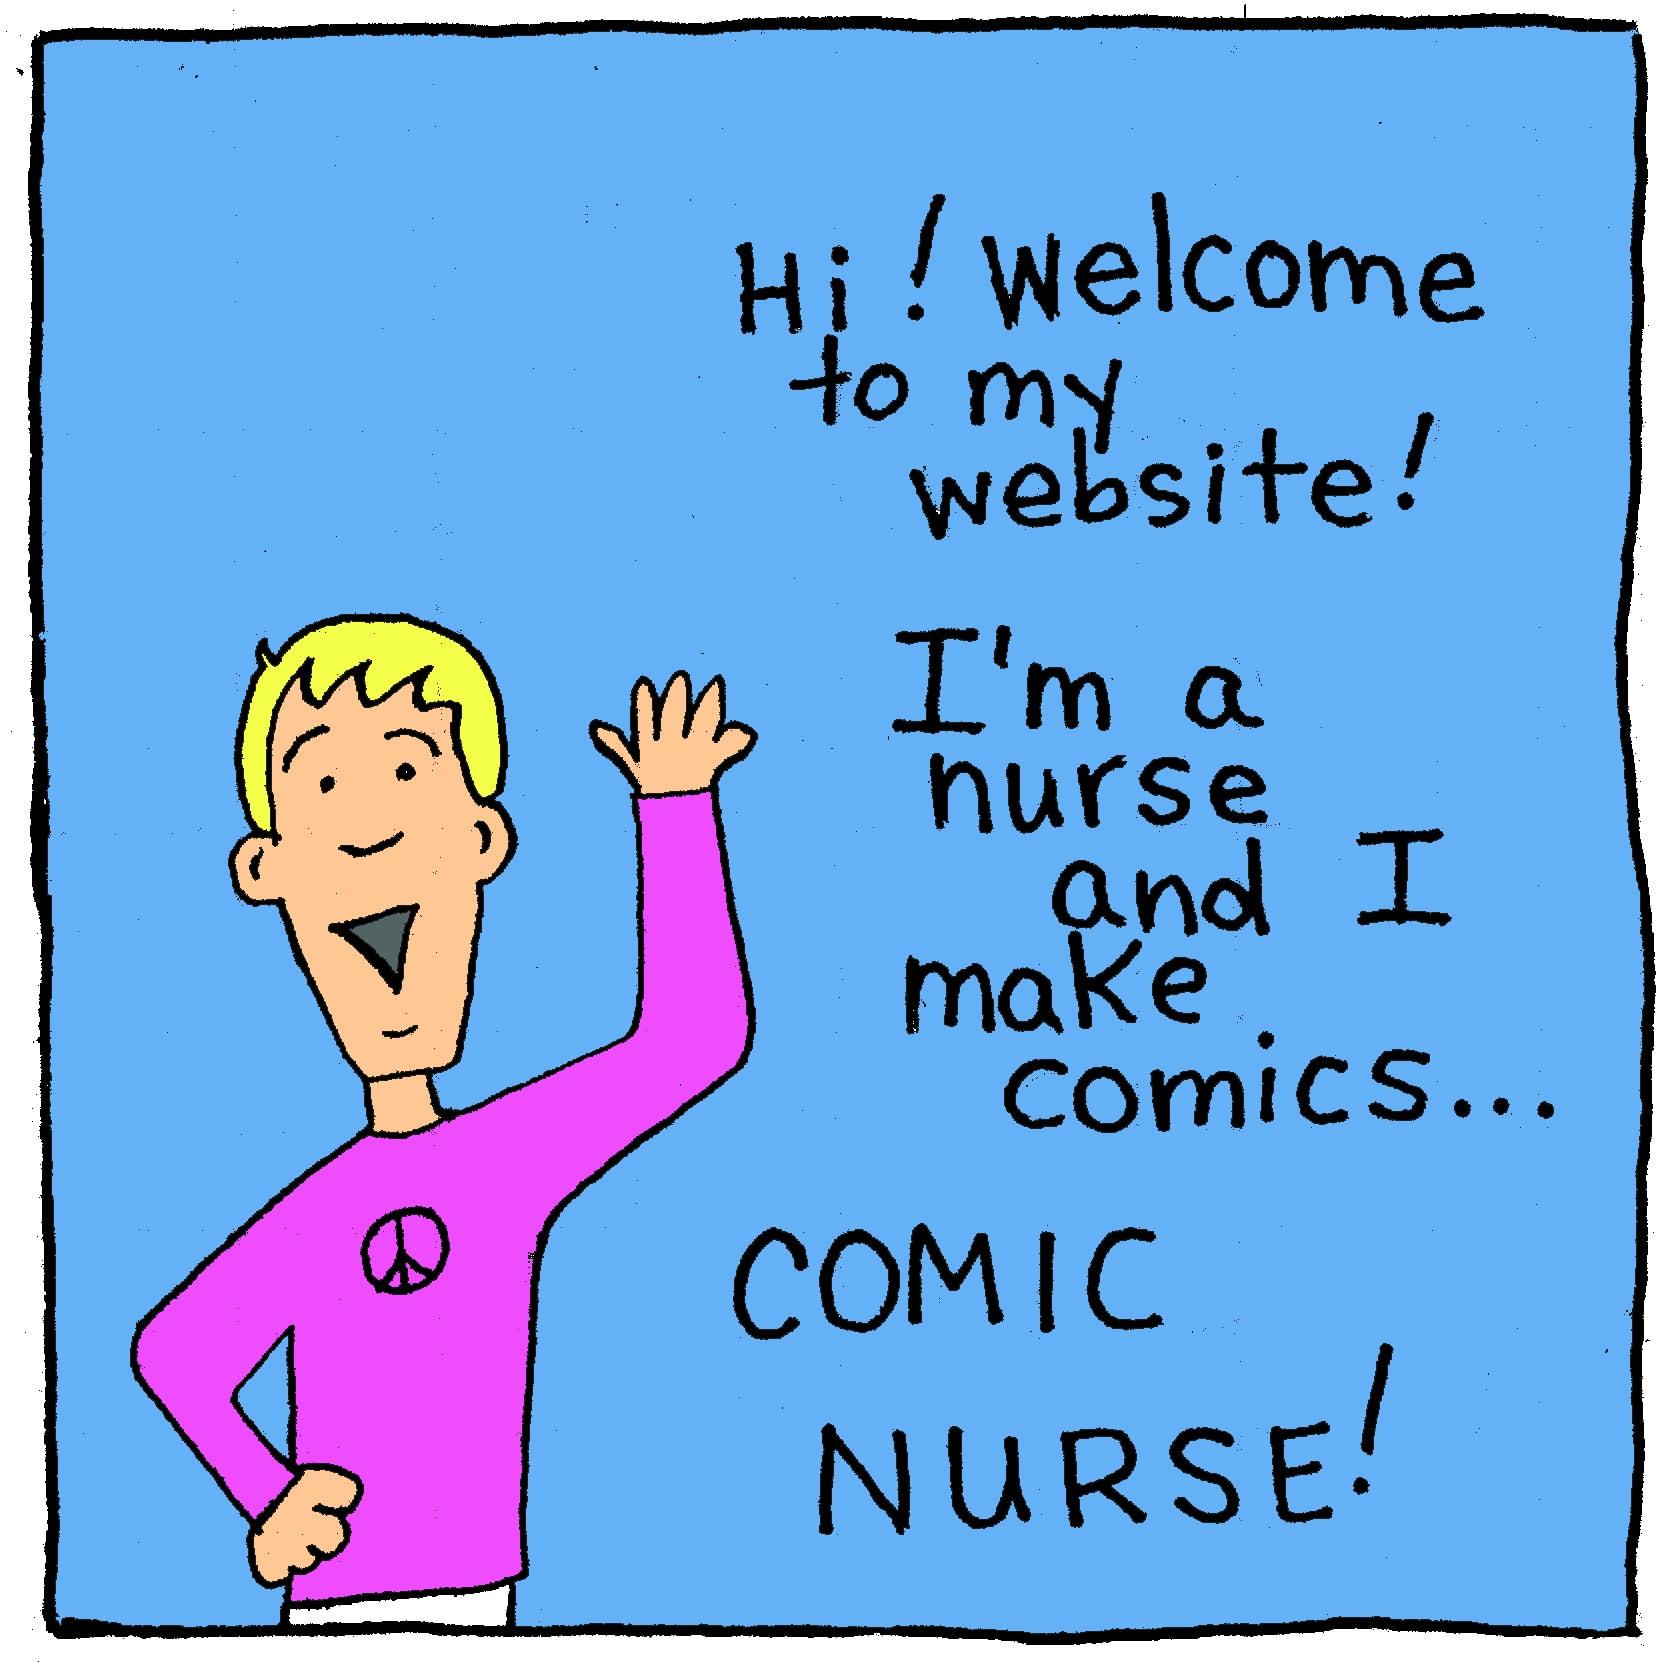 Comic Nurse | Graphic Medicine